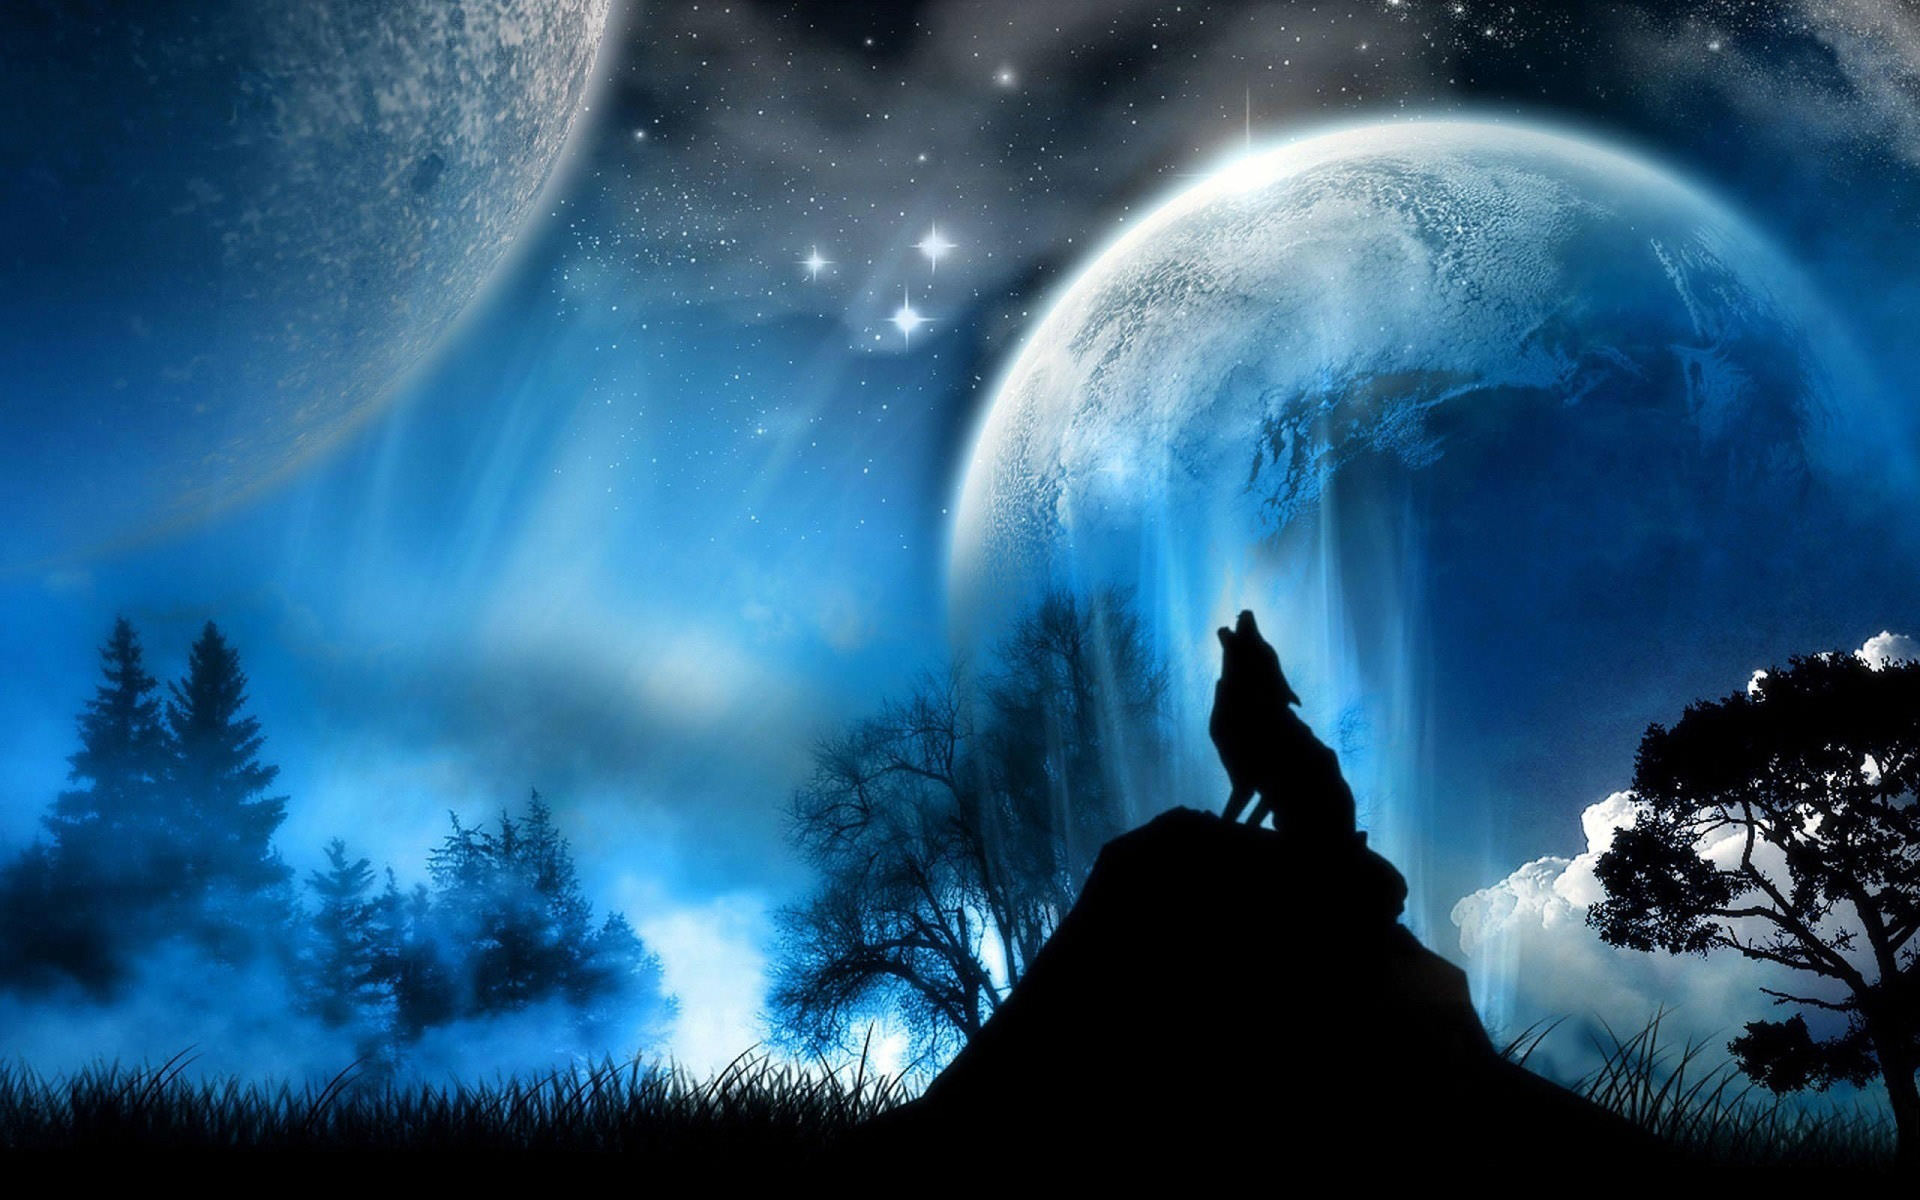 Free 20 Best Moon Desktop Wallpapers In Psd